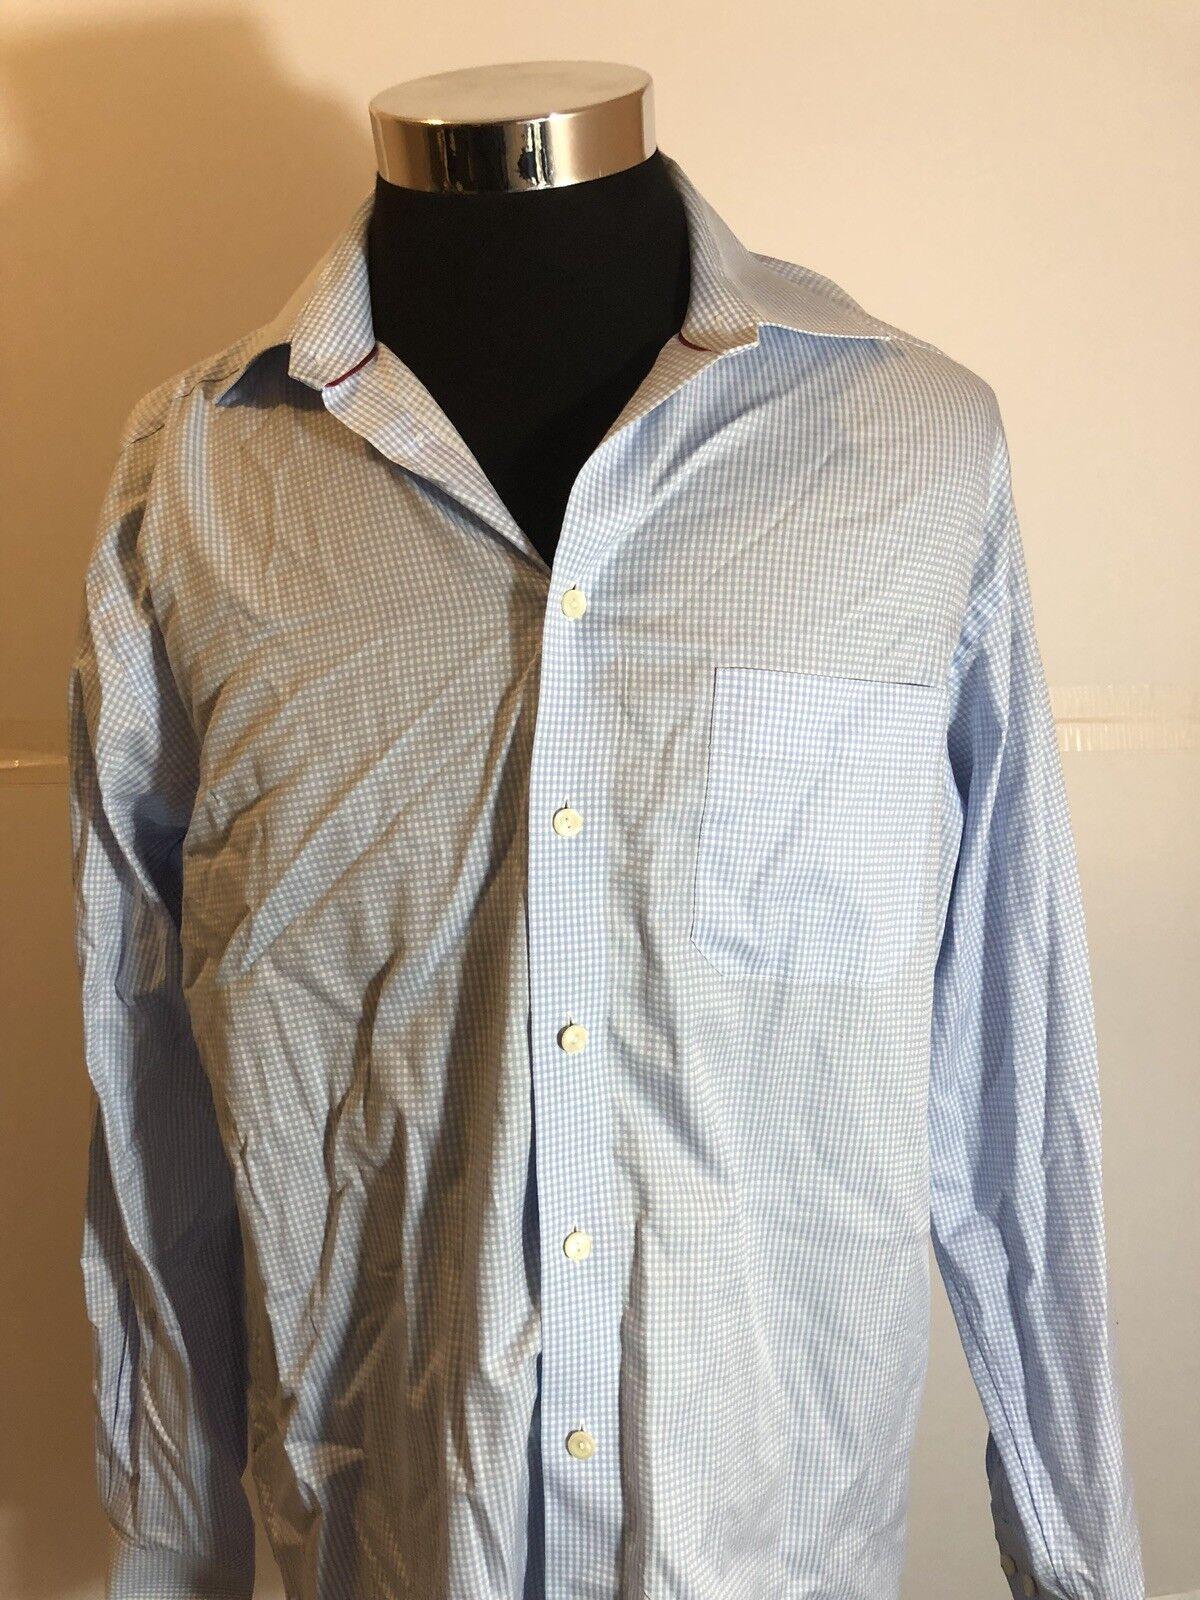 ETON bluee Plaid Cotton Men's Luxury Long S. Dress Shirt  16 Euro 41 Large A12